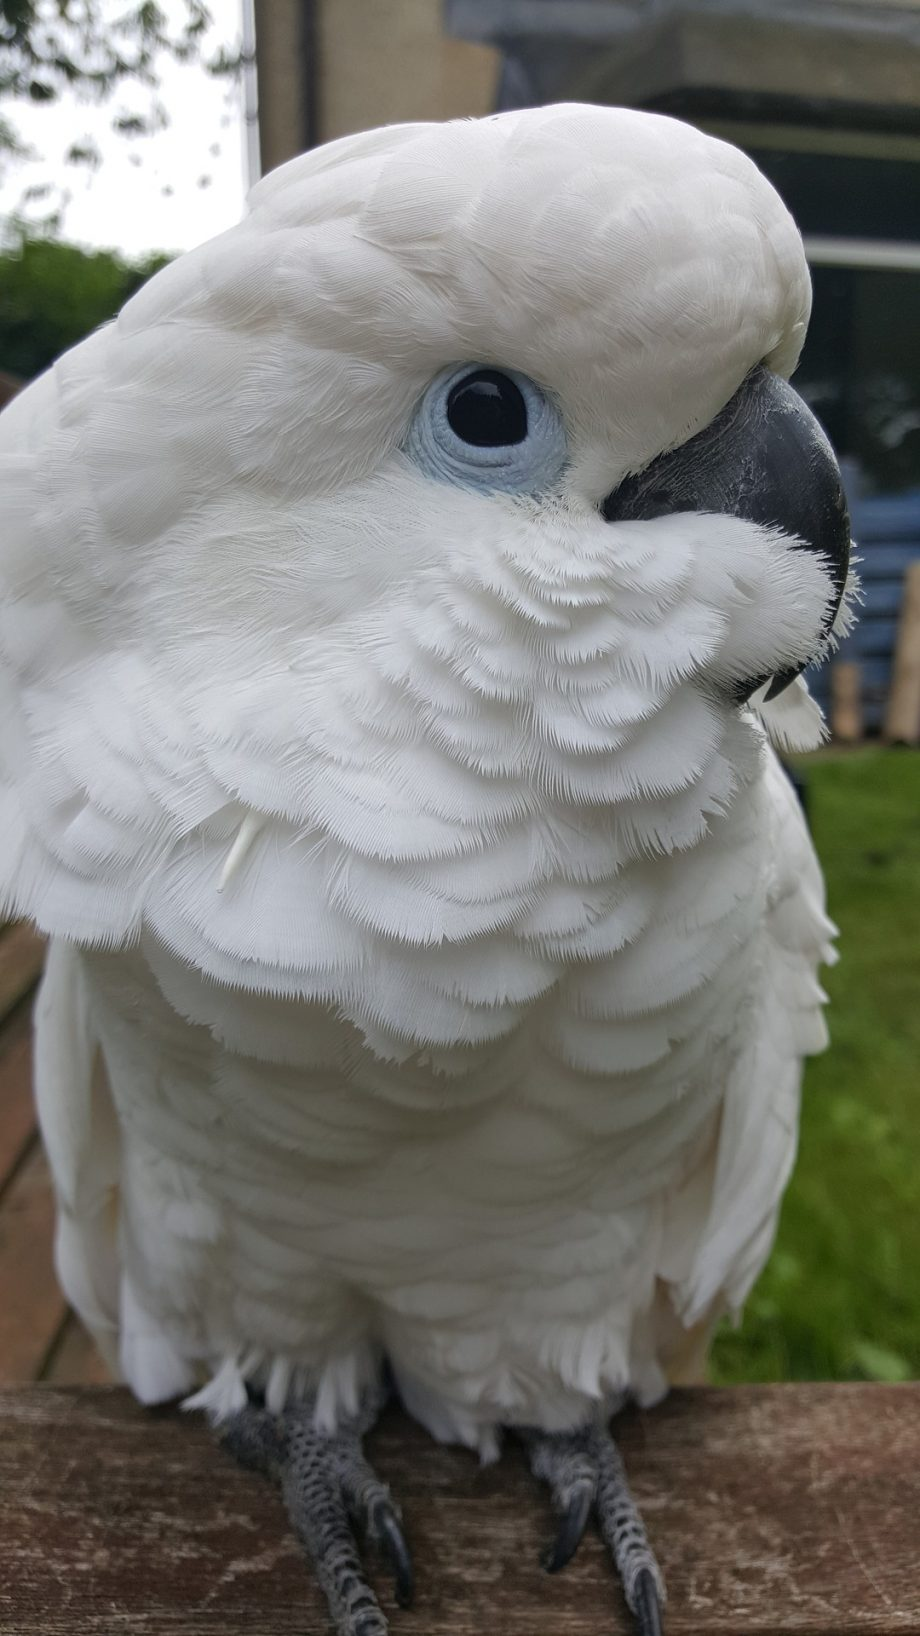 cockatoo-4708576_1920